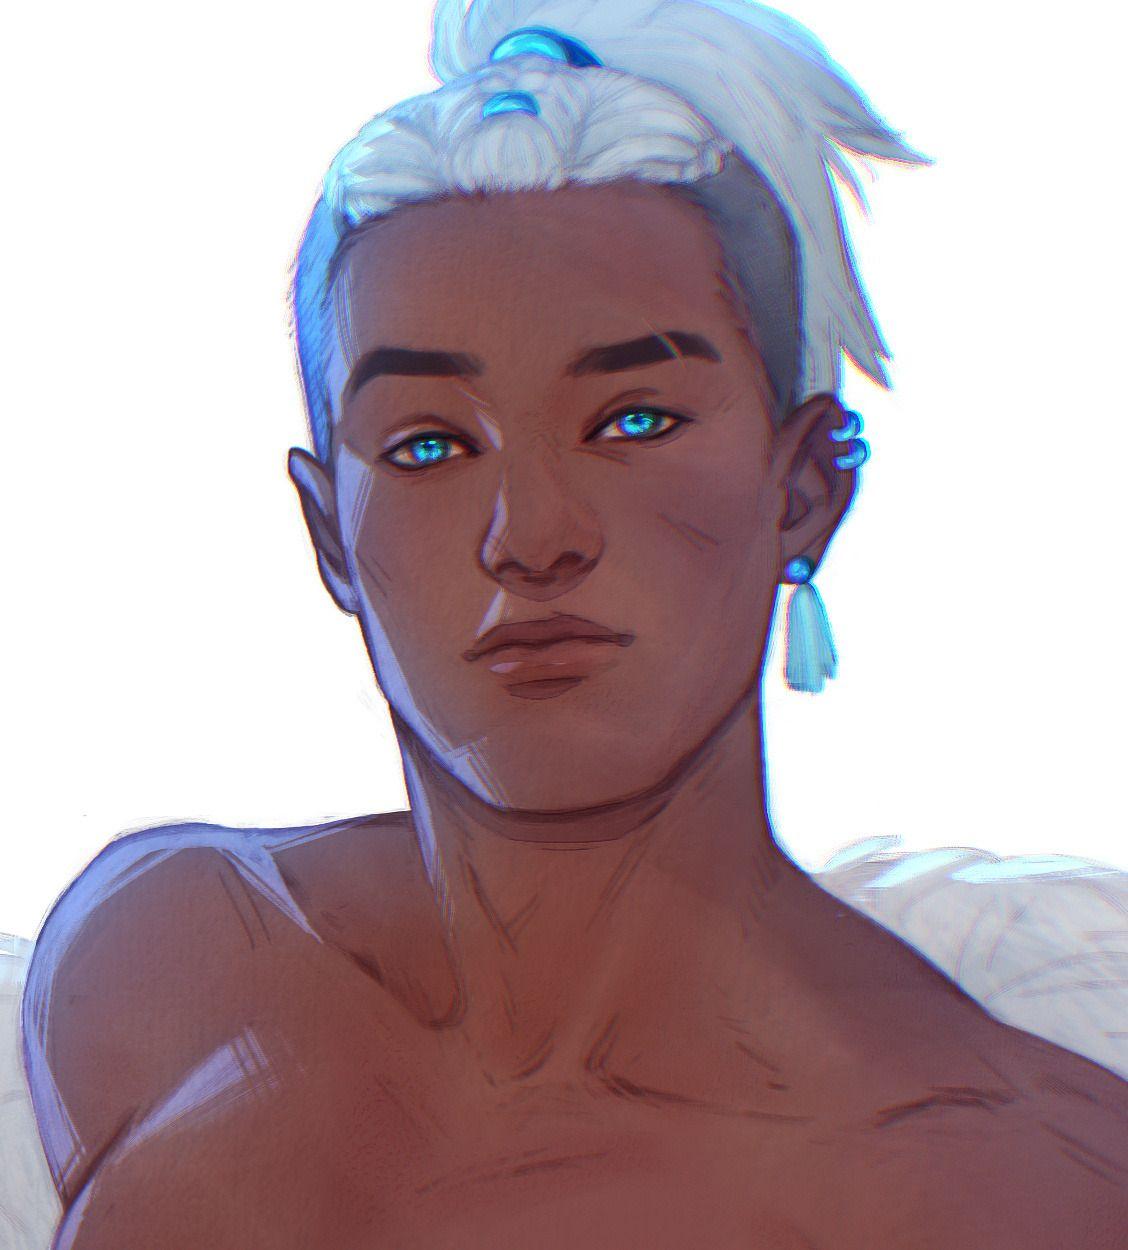 Sword Over Water Sokka White Hair Zuko In 2020 The Last Avatar Avatar The Last Airbender Art Avatar The Last Airbender